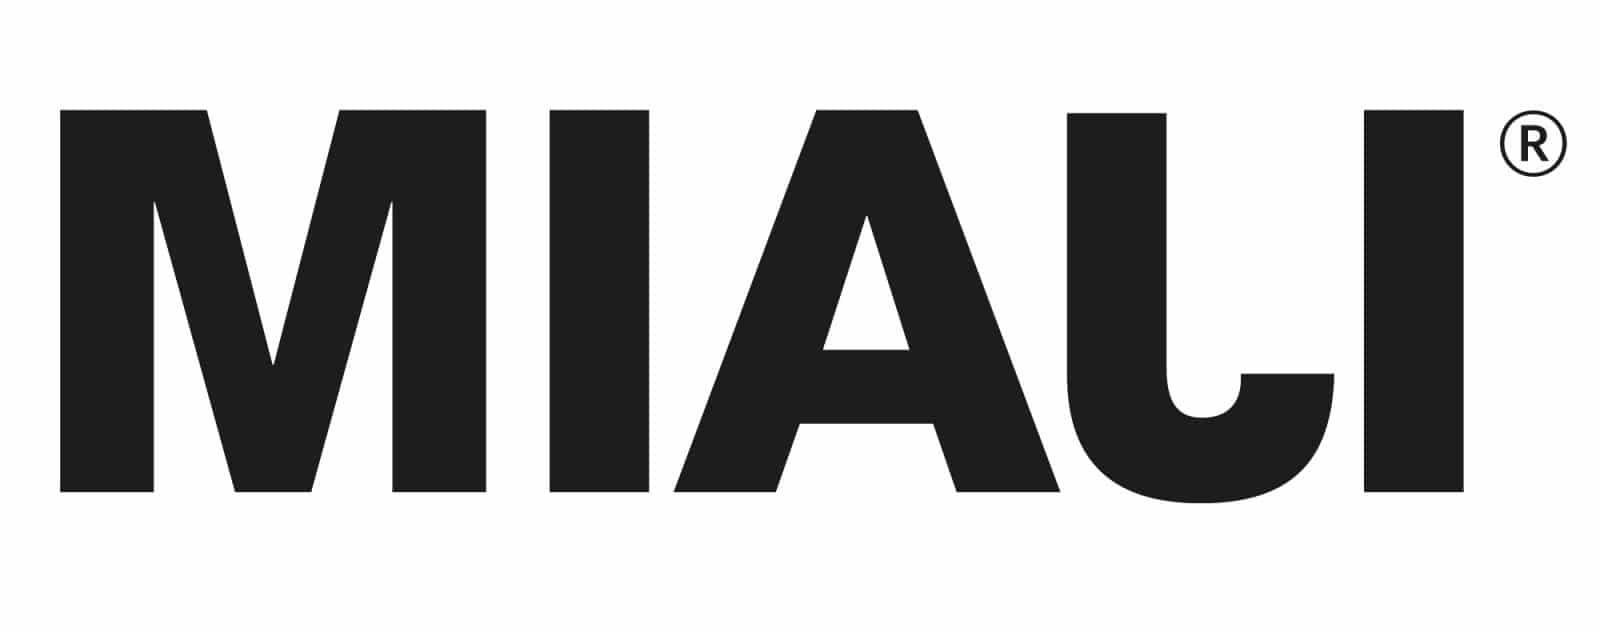 planx-LogoDesign-MIALI